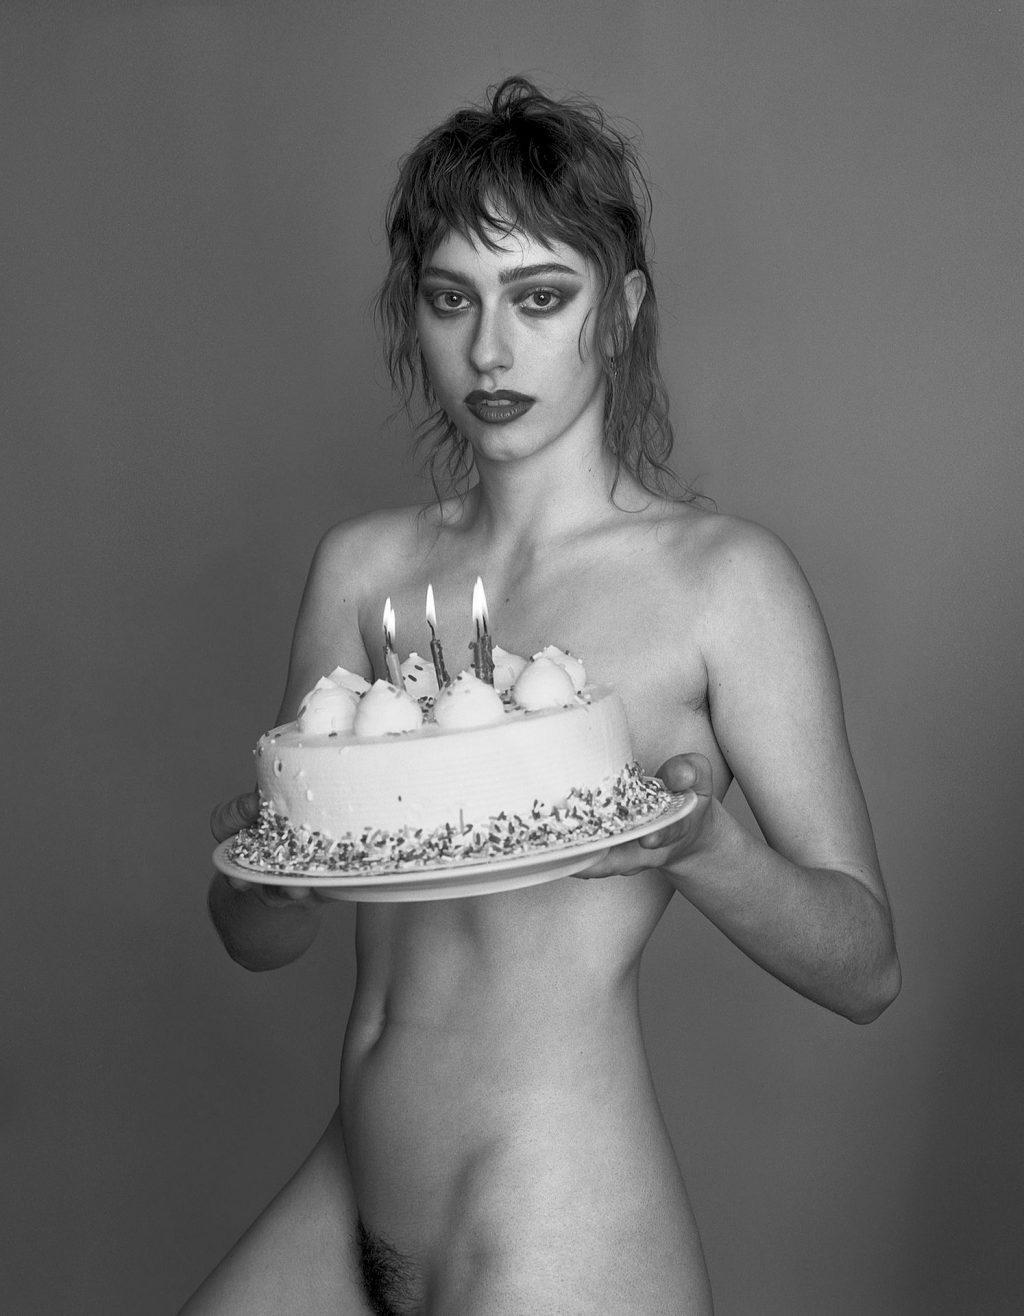 King Princess Nude Collection (20 Photos)